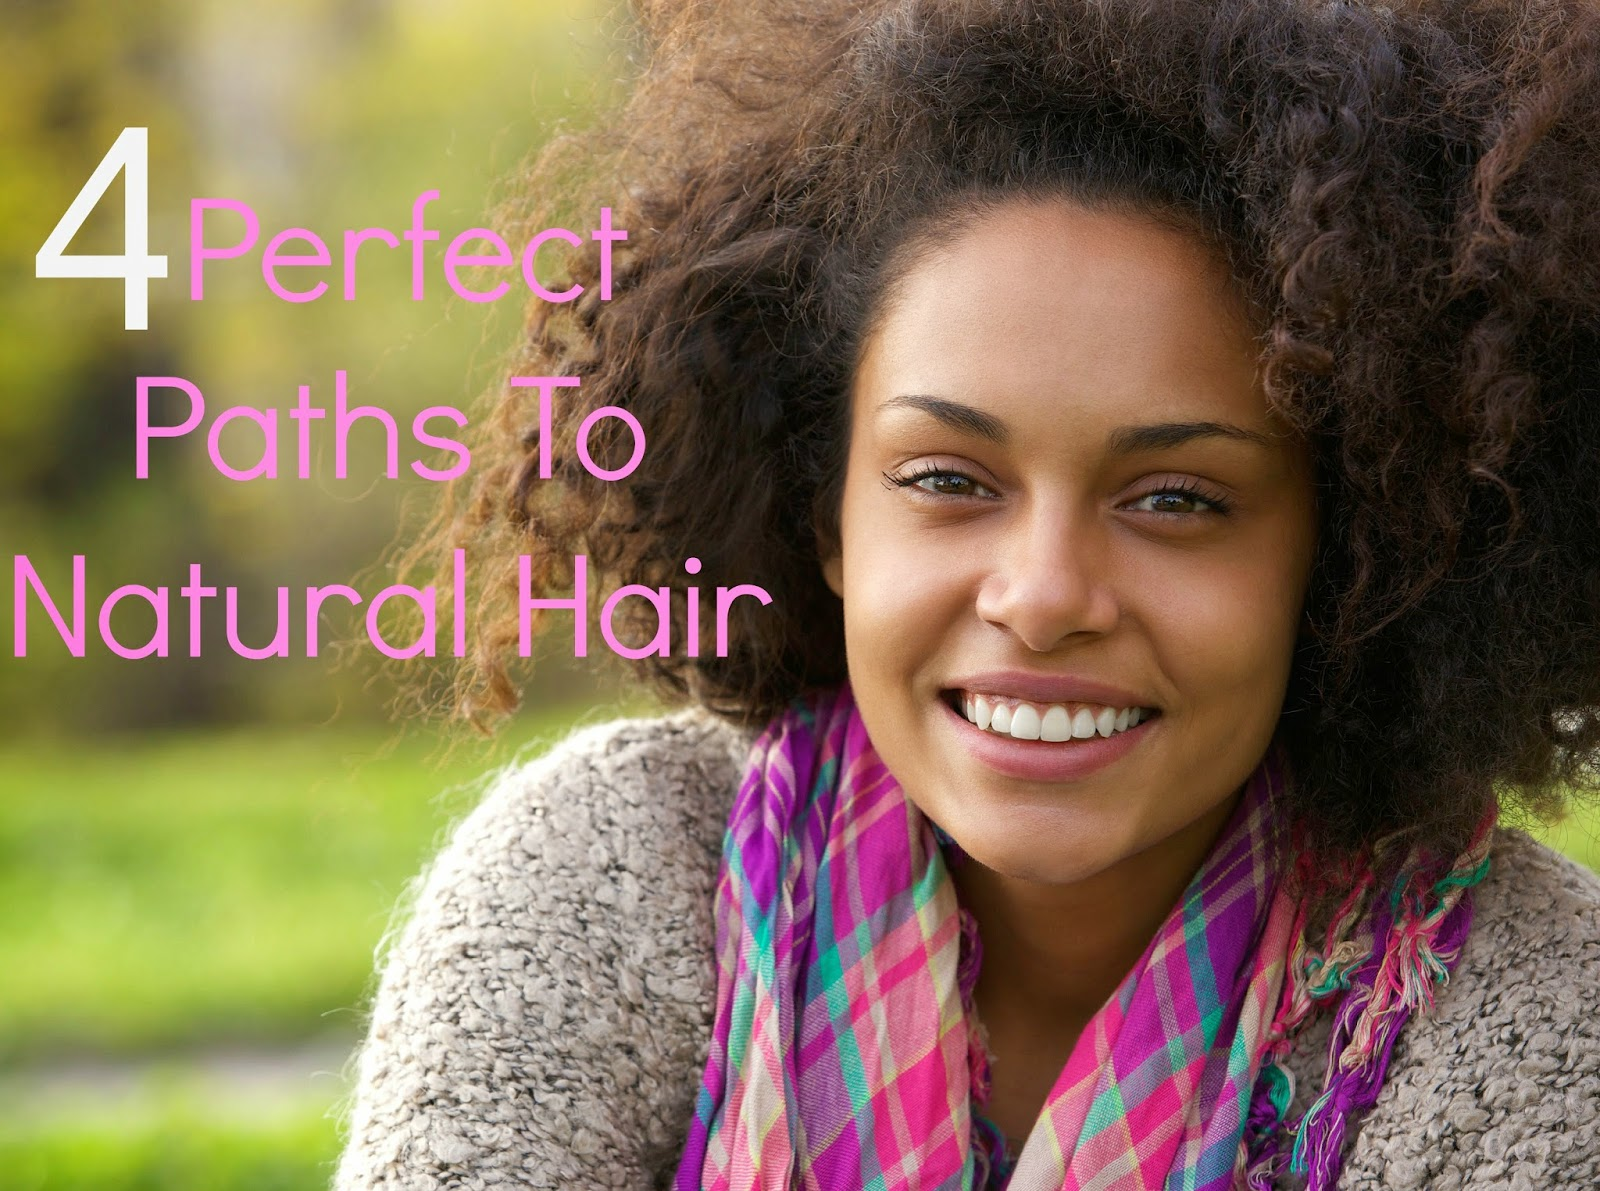 4 Perfect Paths To Natural Hair